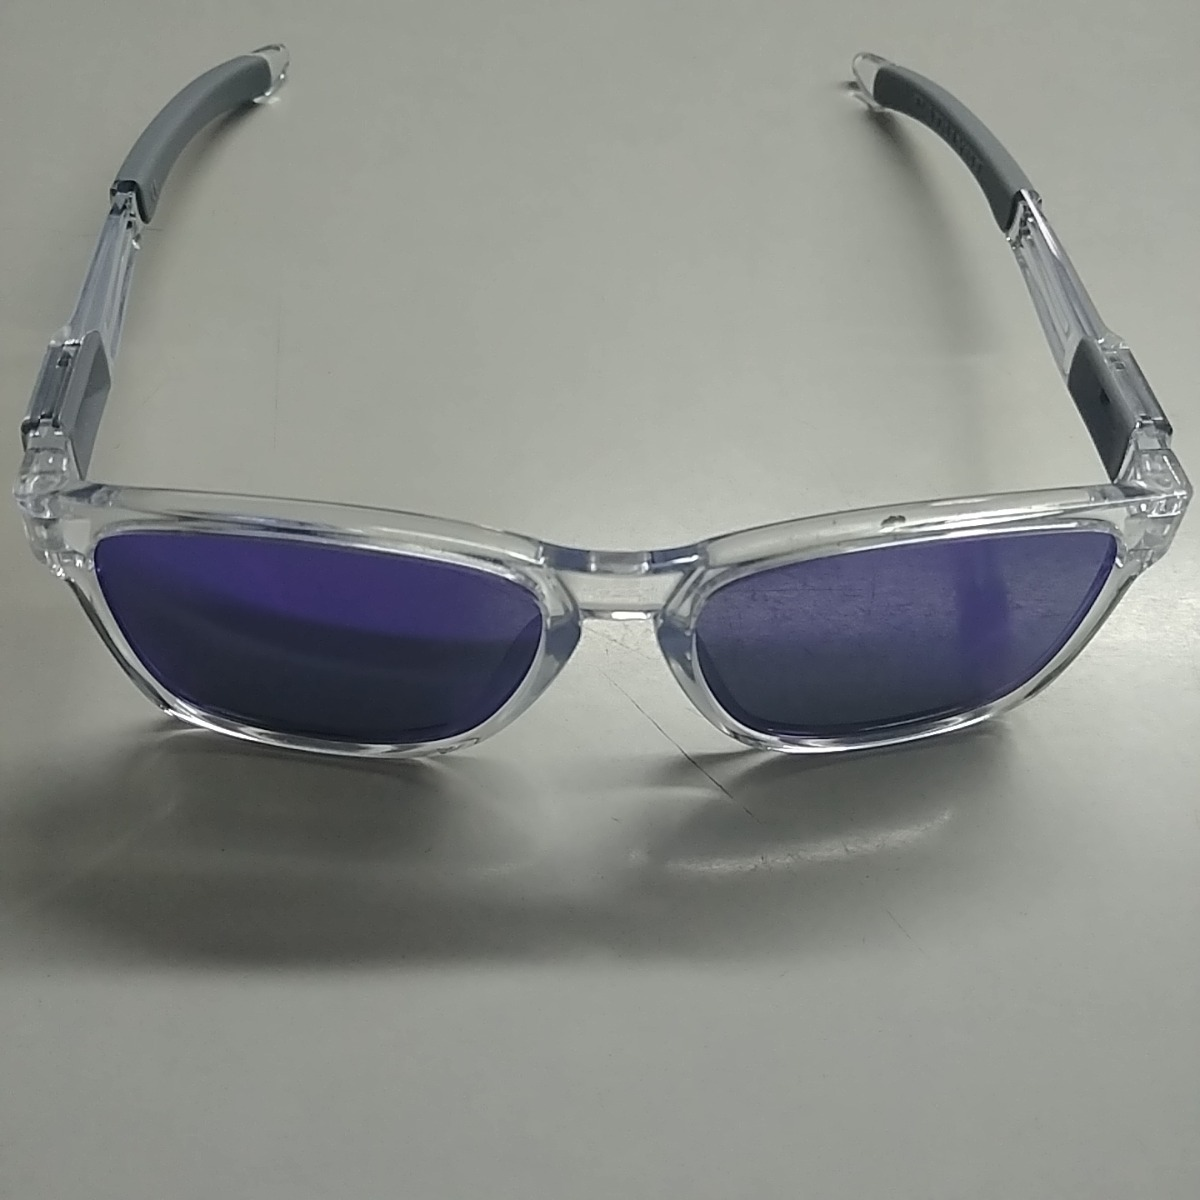 e1ec9df9929e1 Óculos De Sol Oakley Catalyst Iridium - Unissex - R  299,00 em ...